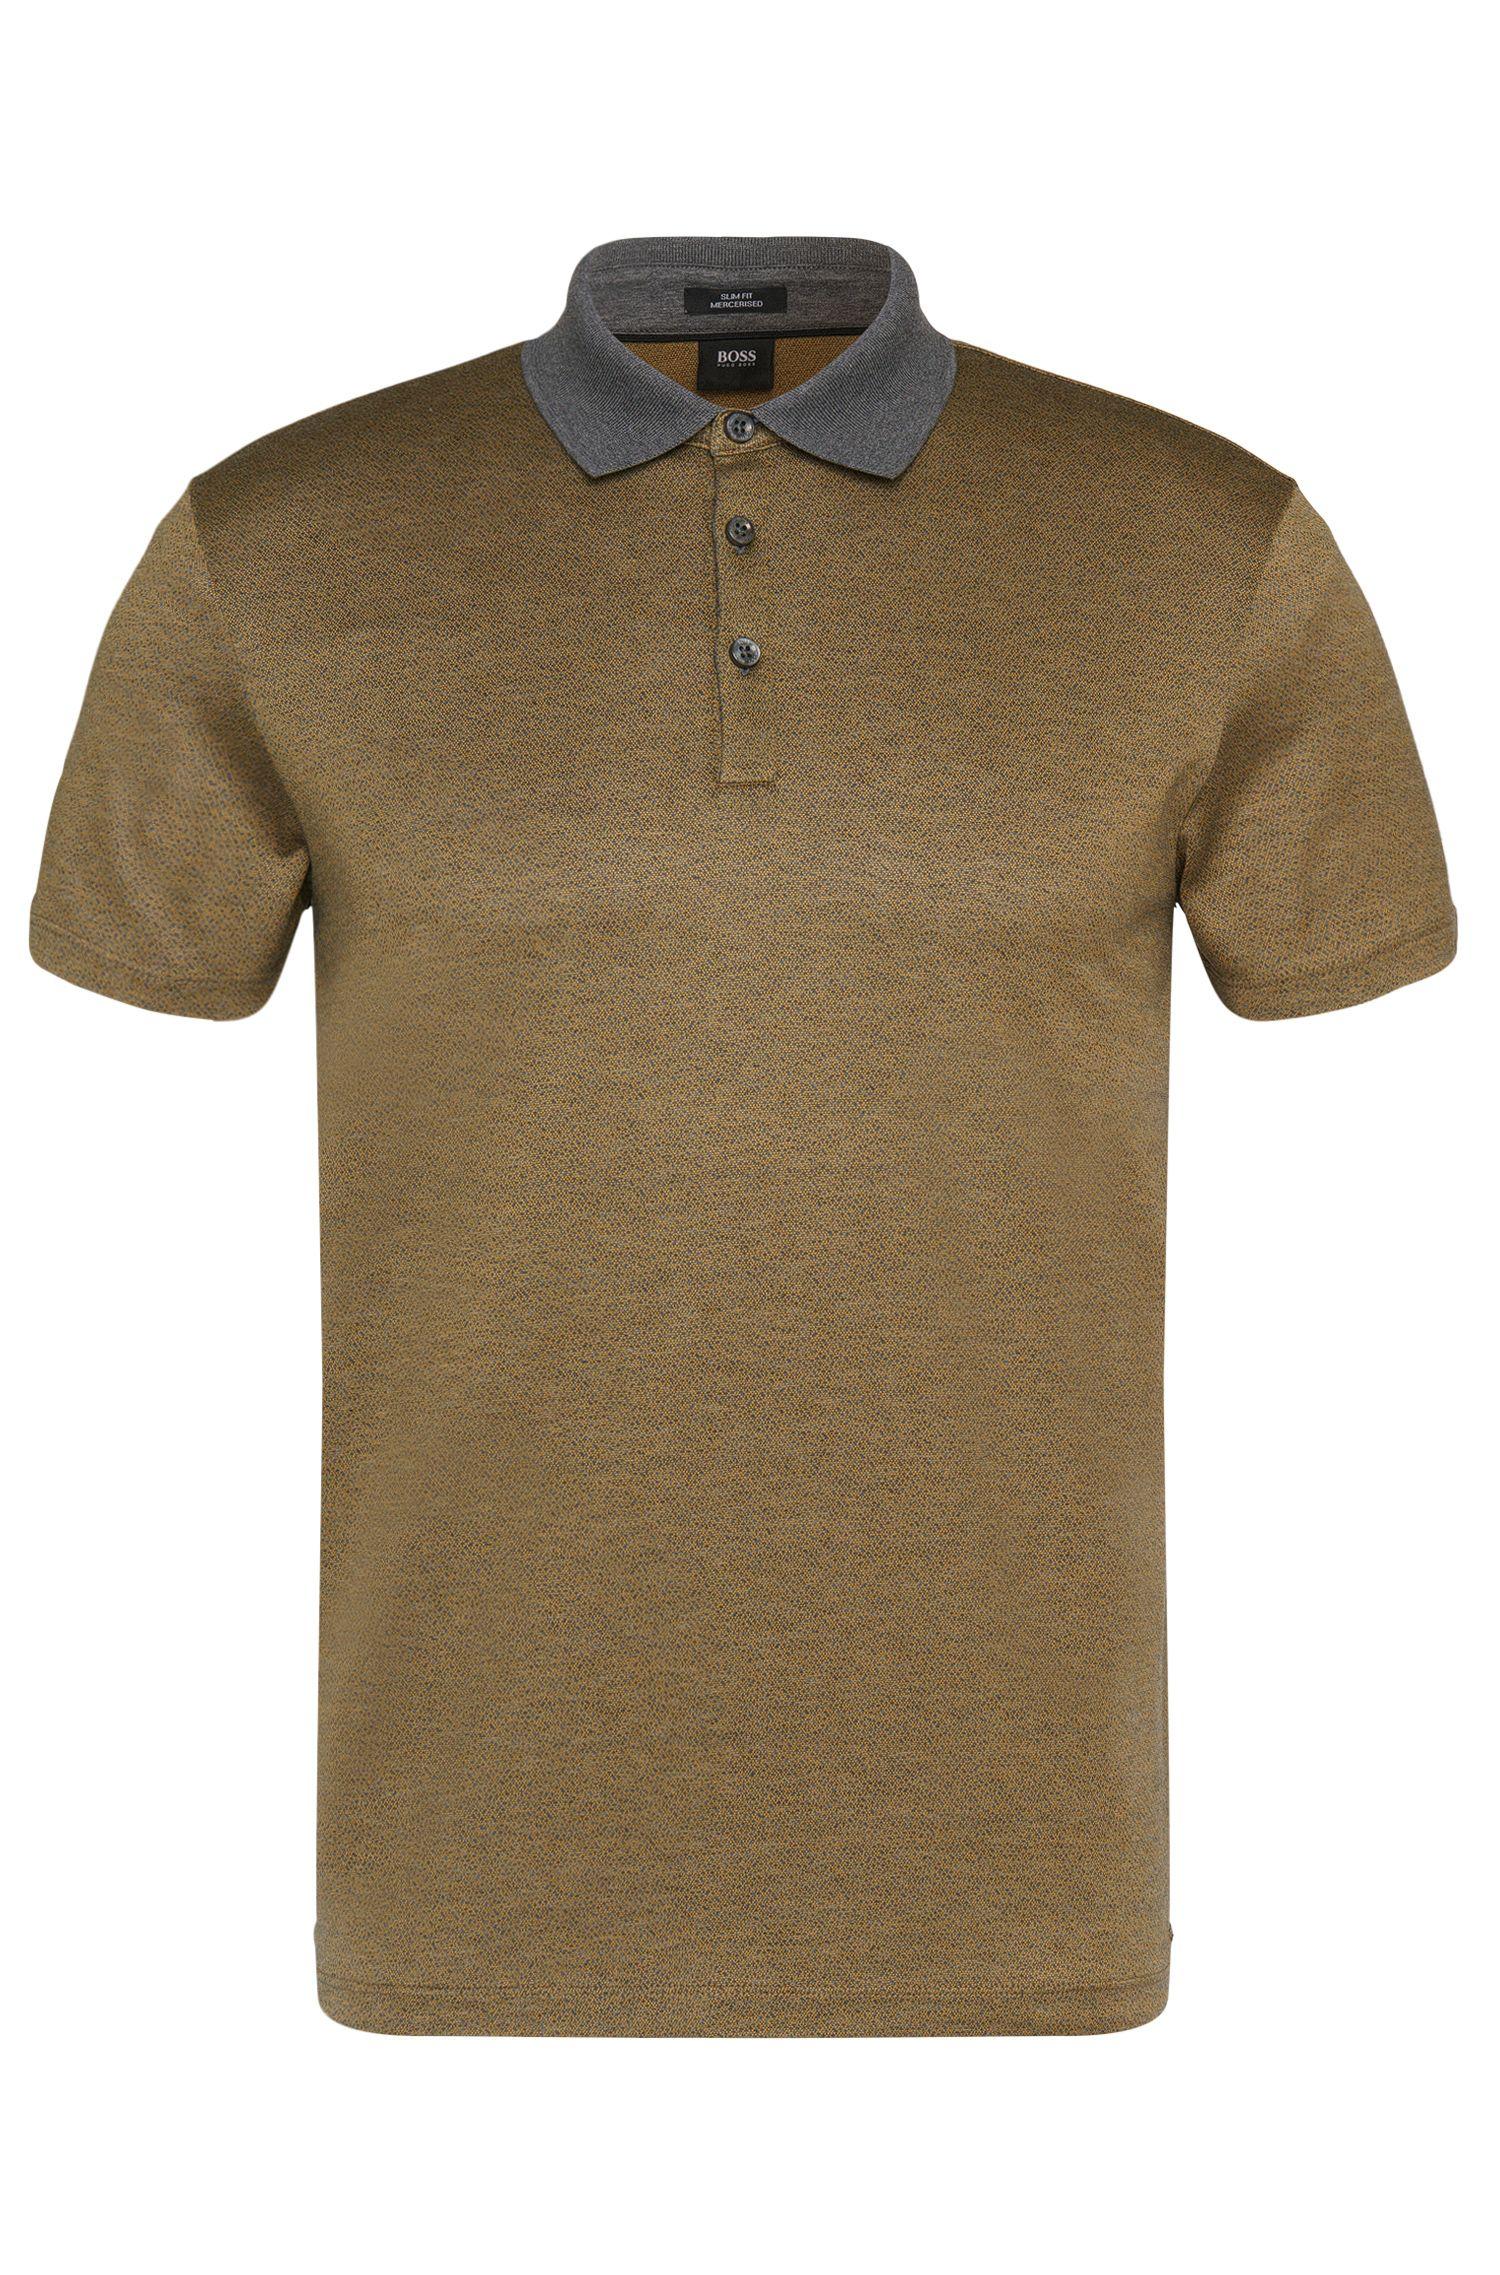 Gemustertes Slim-Fit Poloshirt aus Baumwolle: 'Platt 03'